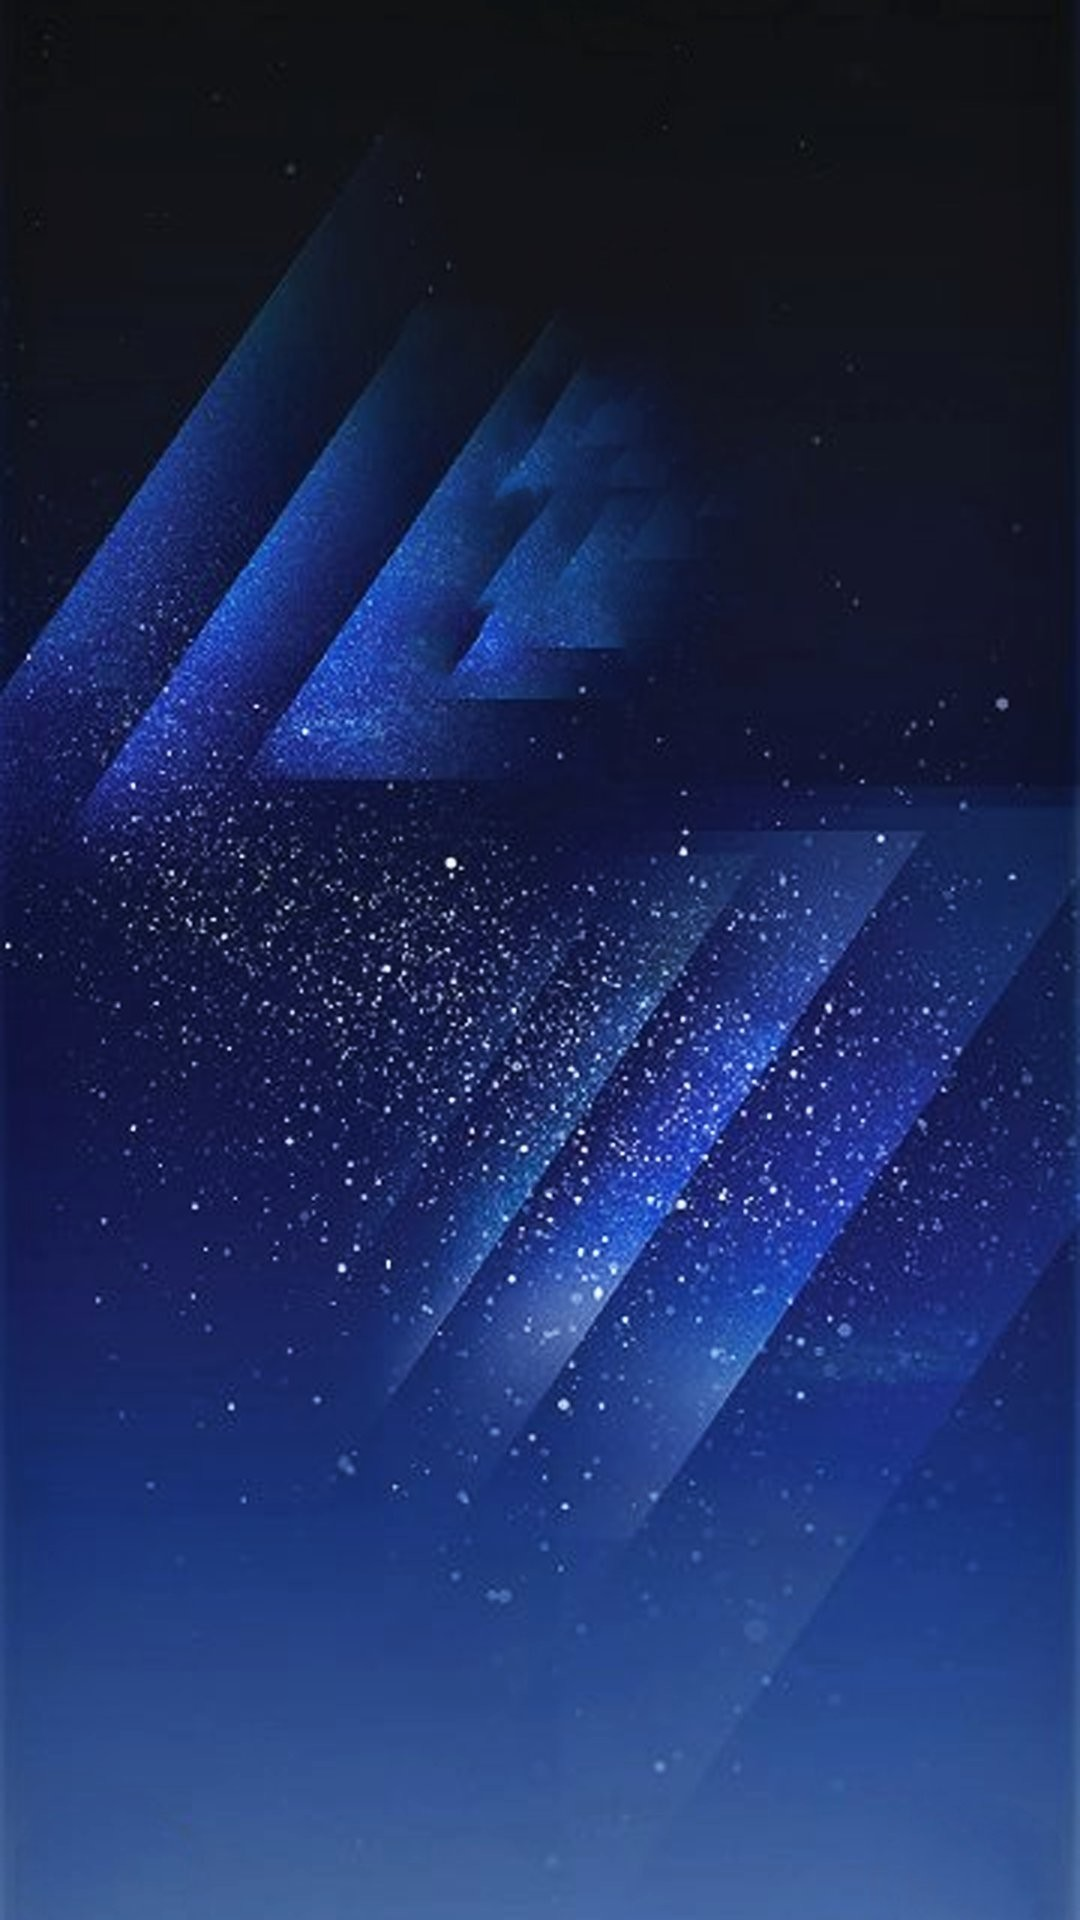 Samsung Phone Wallpaper 74 Images